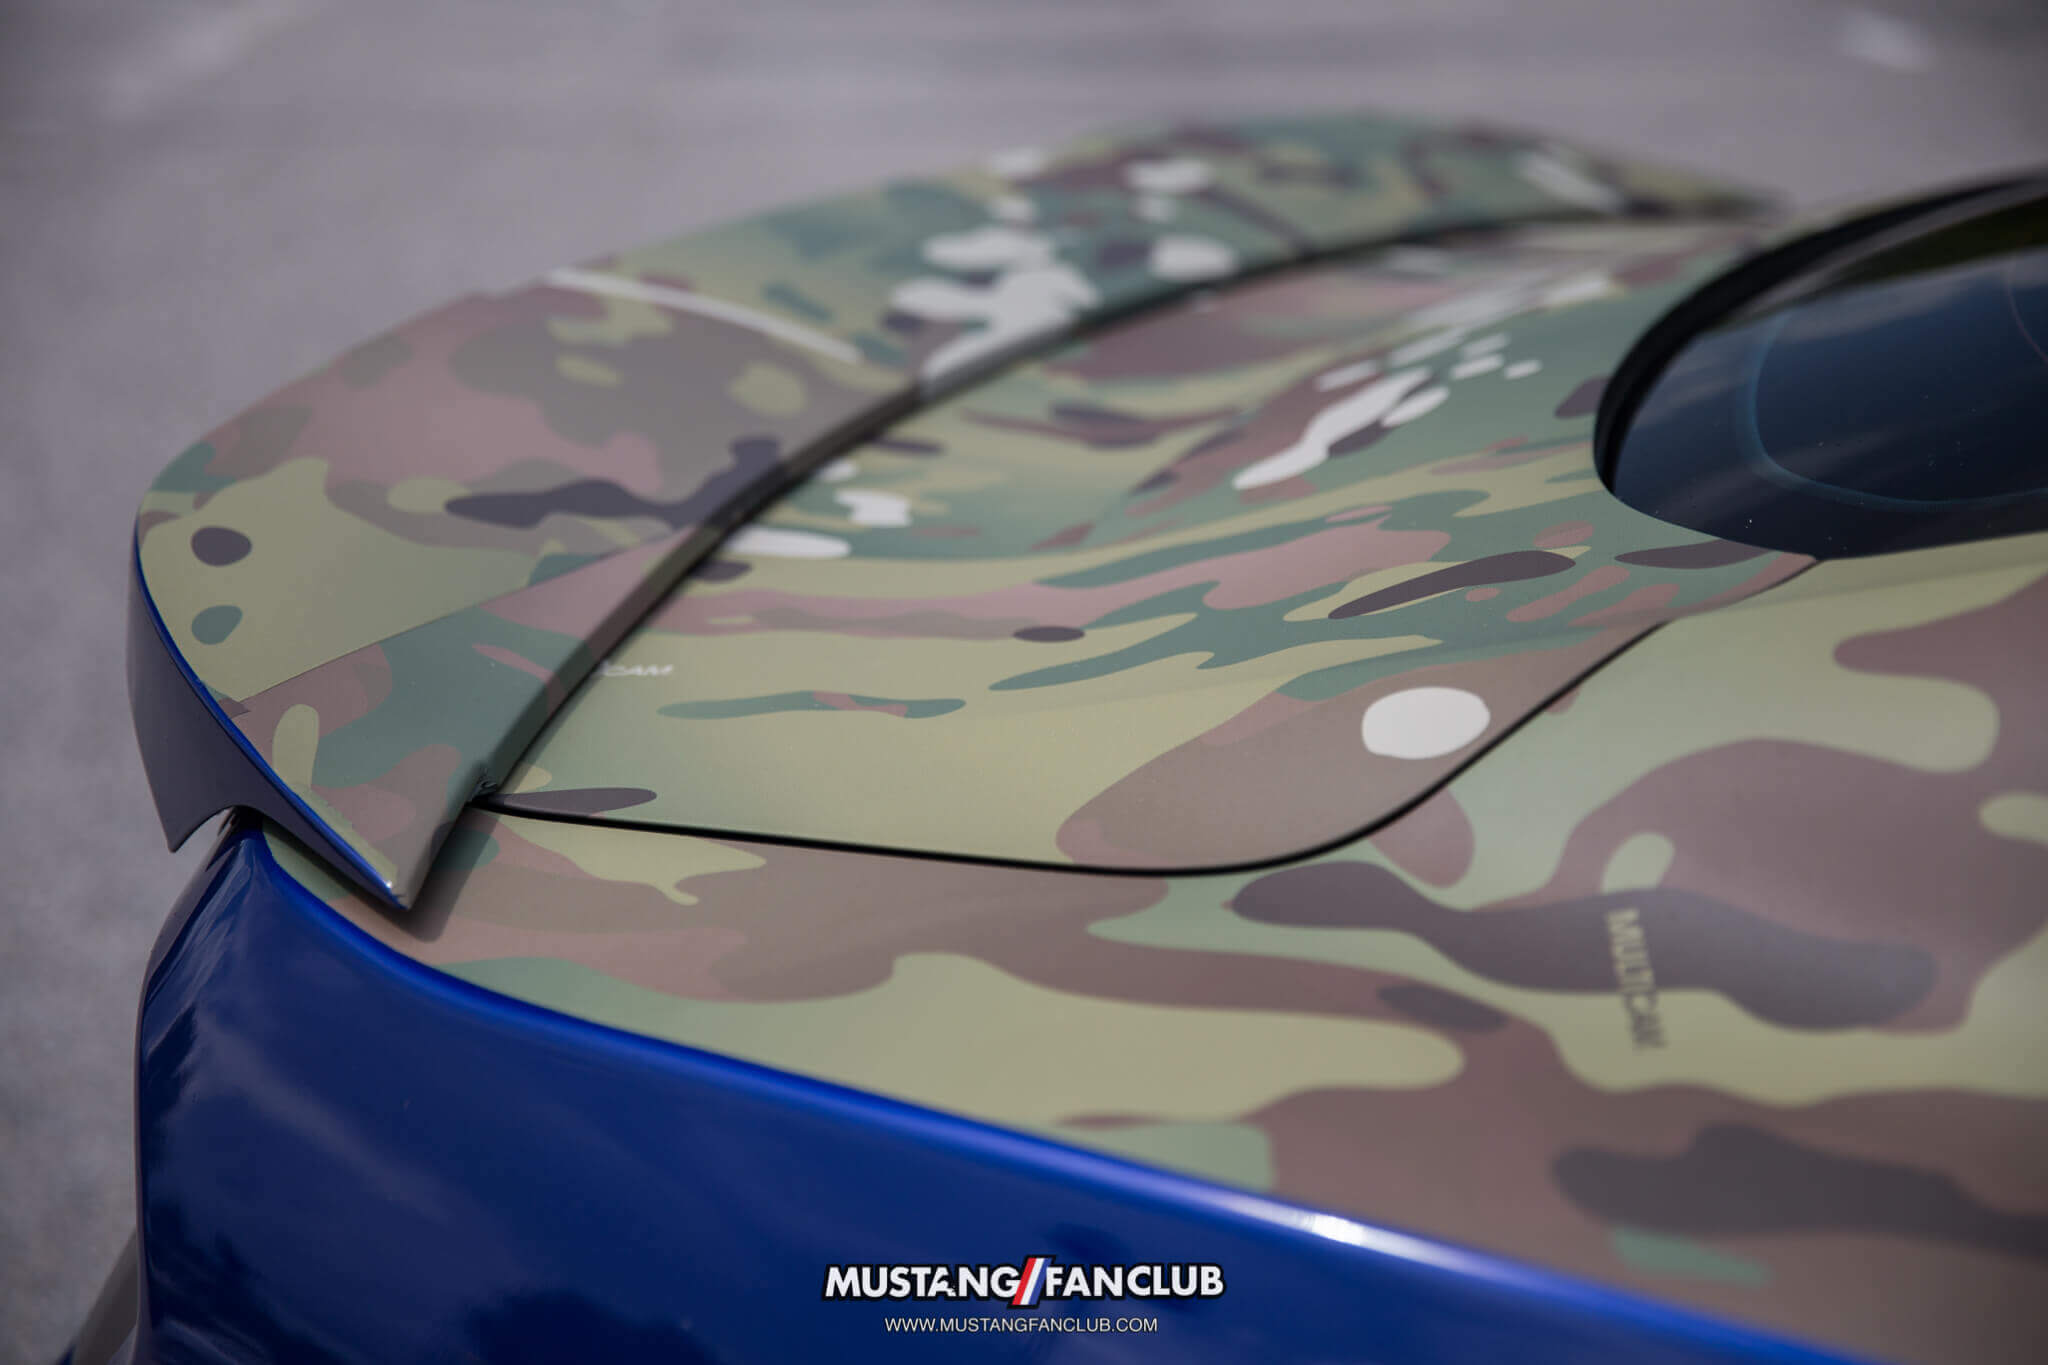 deep impact blue s550 mustang fan club roush performance front fascia camo wrap upr products steve gelles mustang week 2016 16'